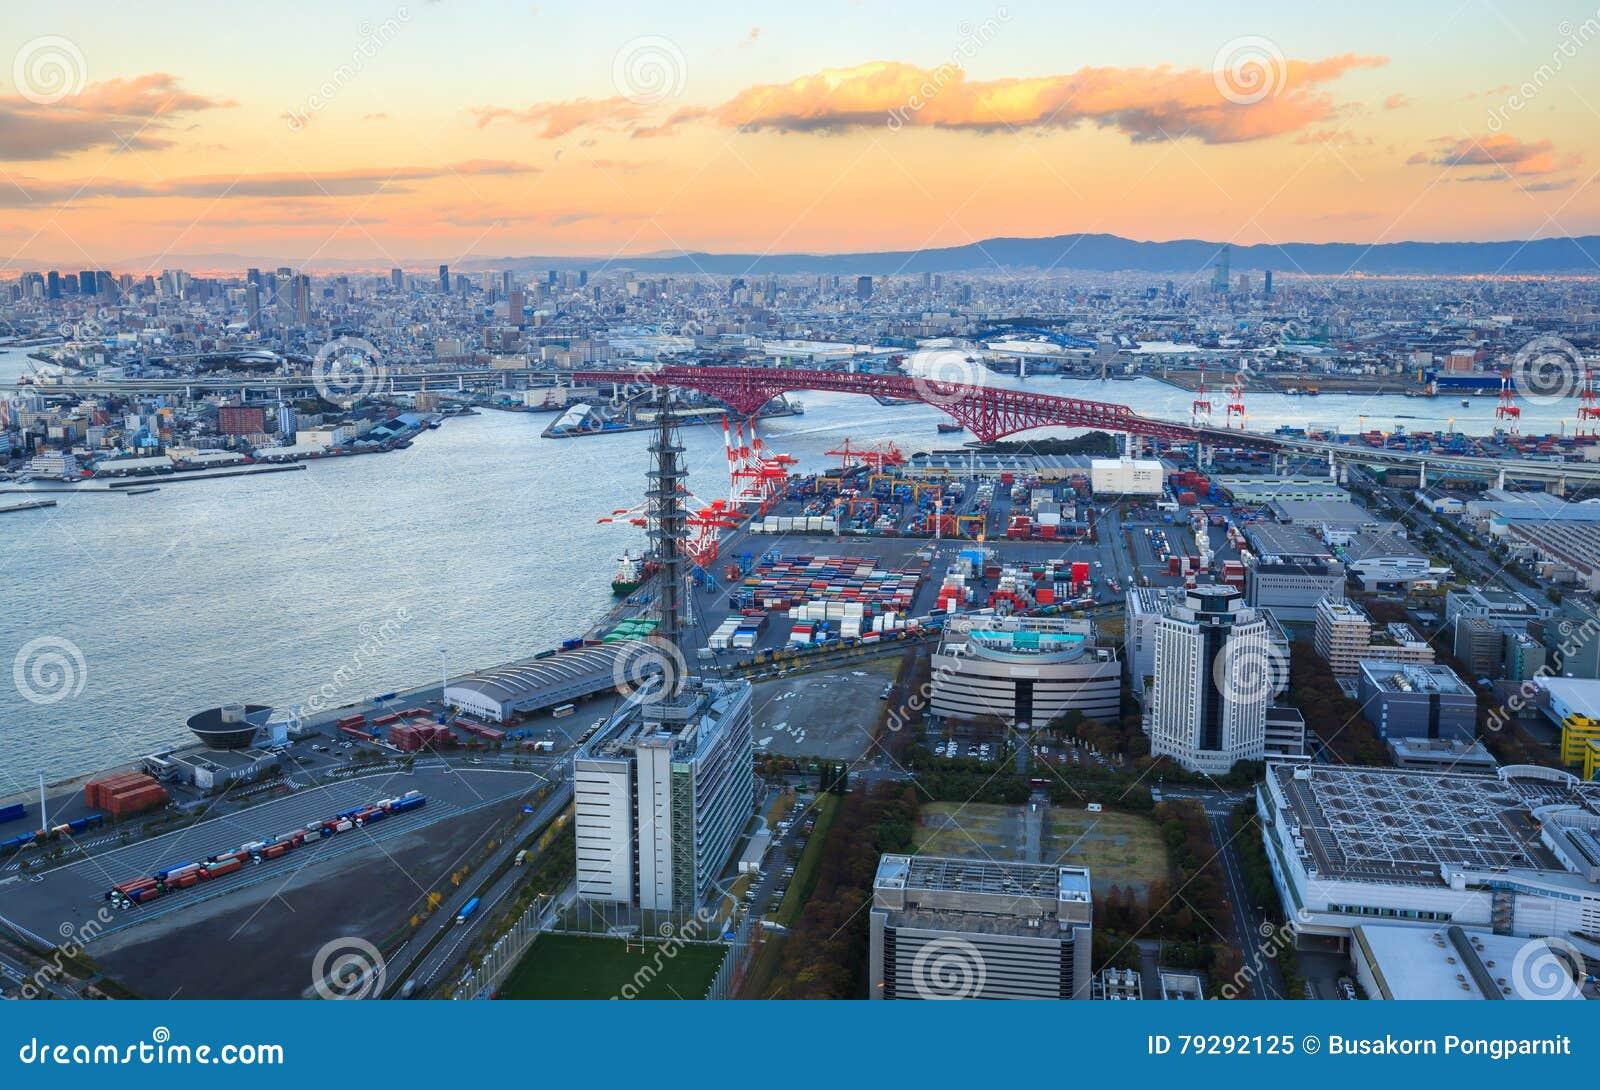 Osaka Bay, in Osaka Japan Industries bepaalt rond van de plaats